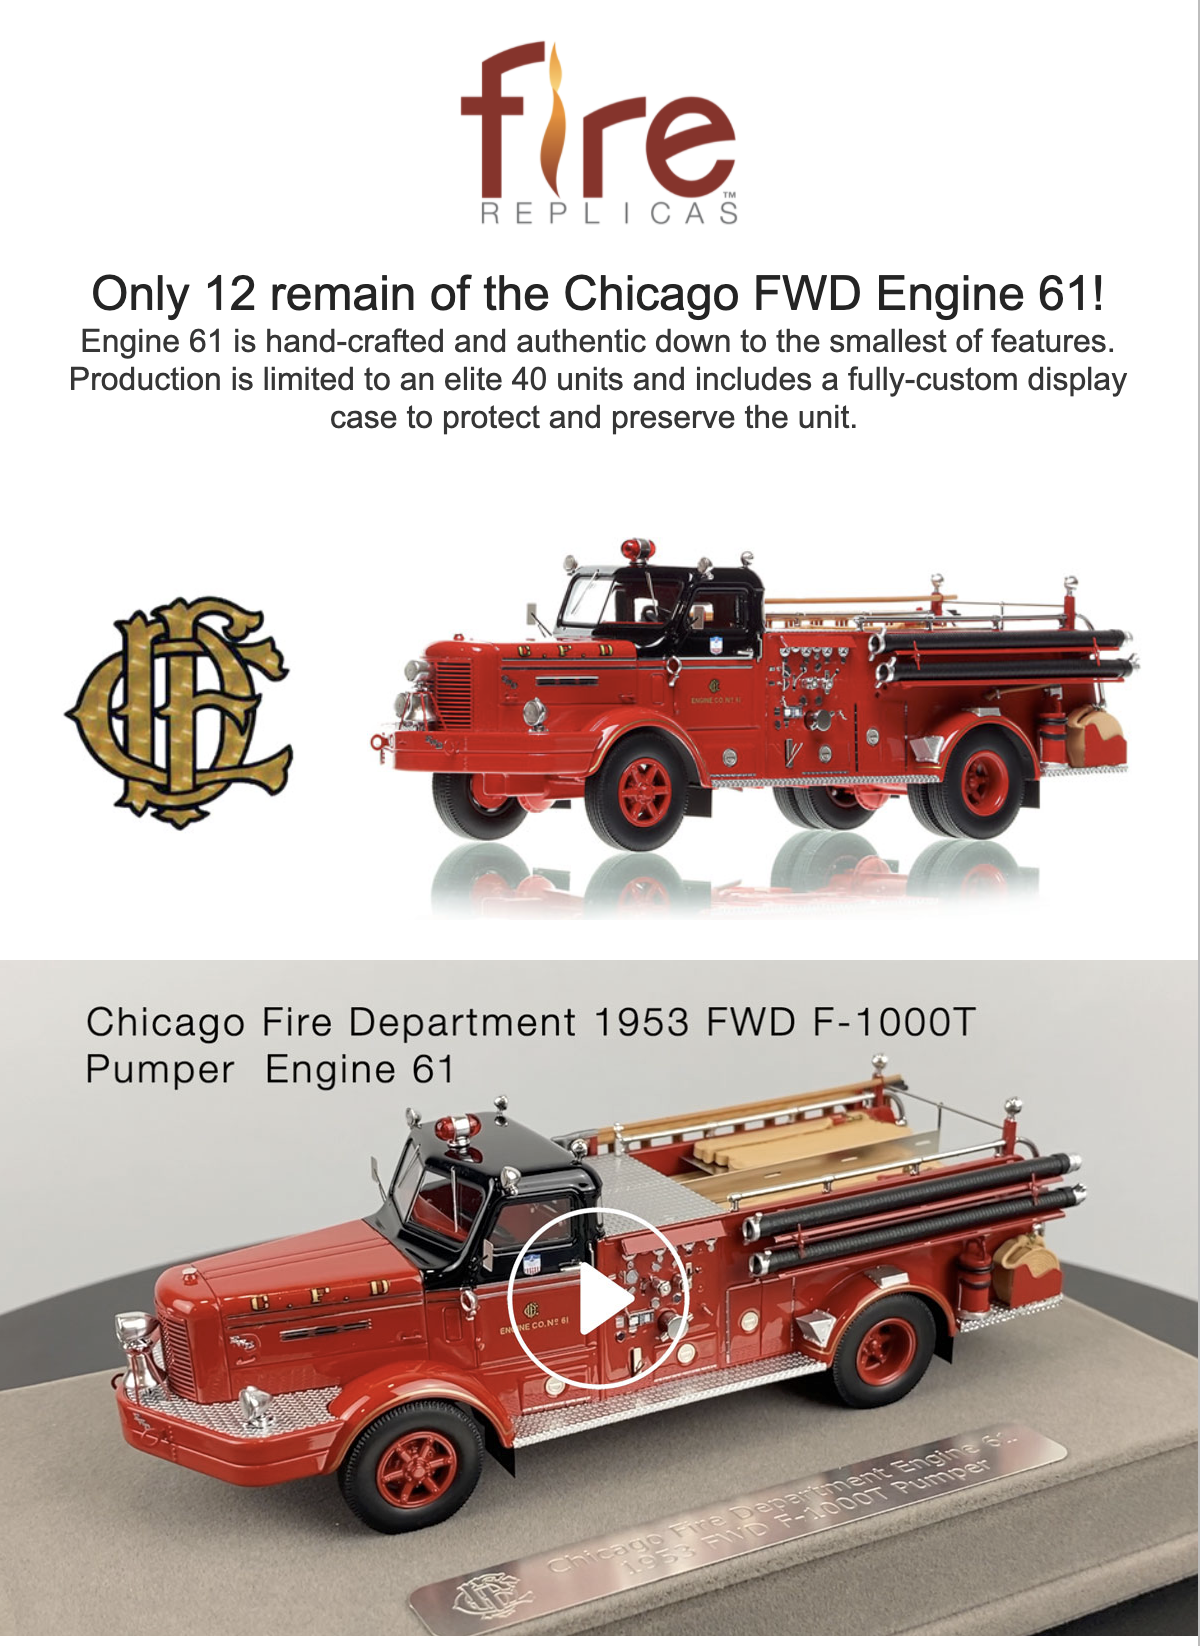 Chicago FD 1953 FWD fire engine replica model